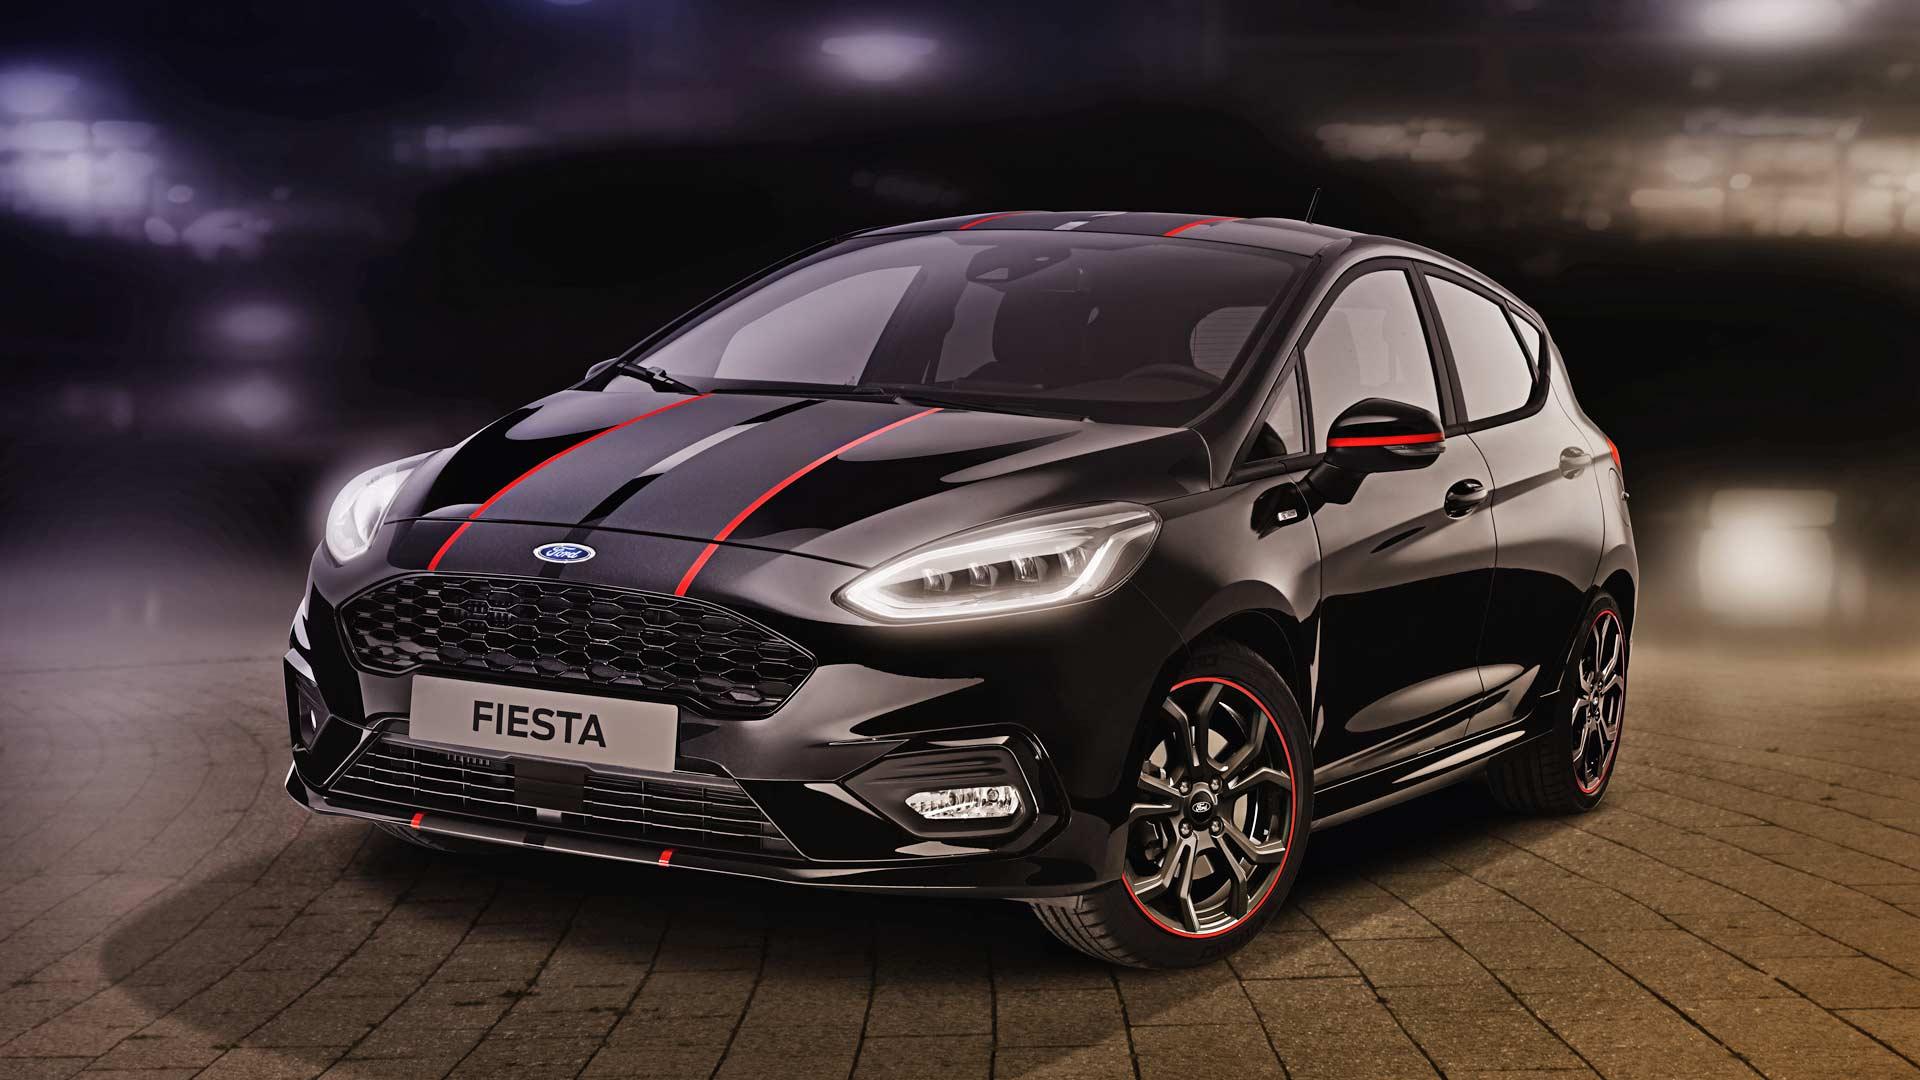 2018 Ford Fiesta ST-Line Black Edition